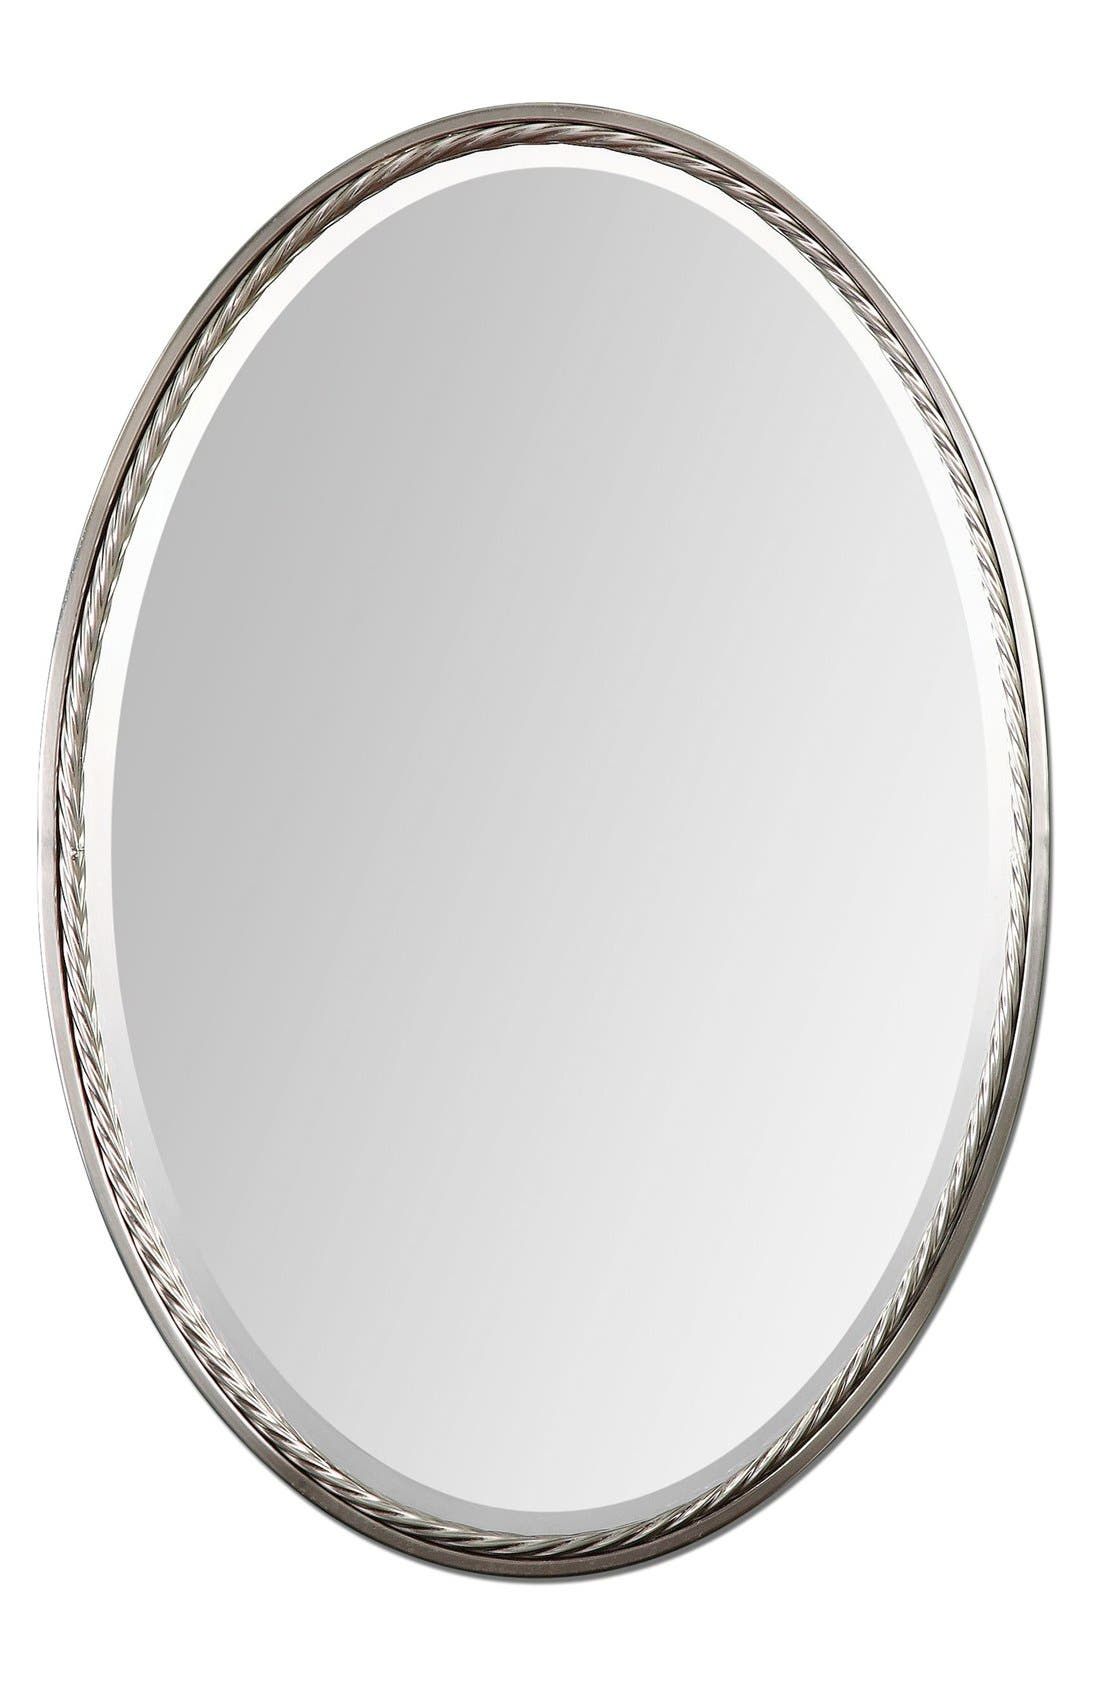 Alternate Image 1 Selected - Uttermost 'Casalina' Oval Mirror